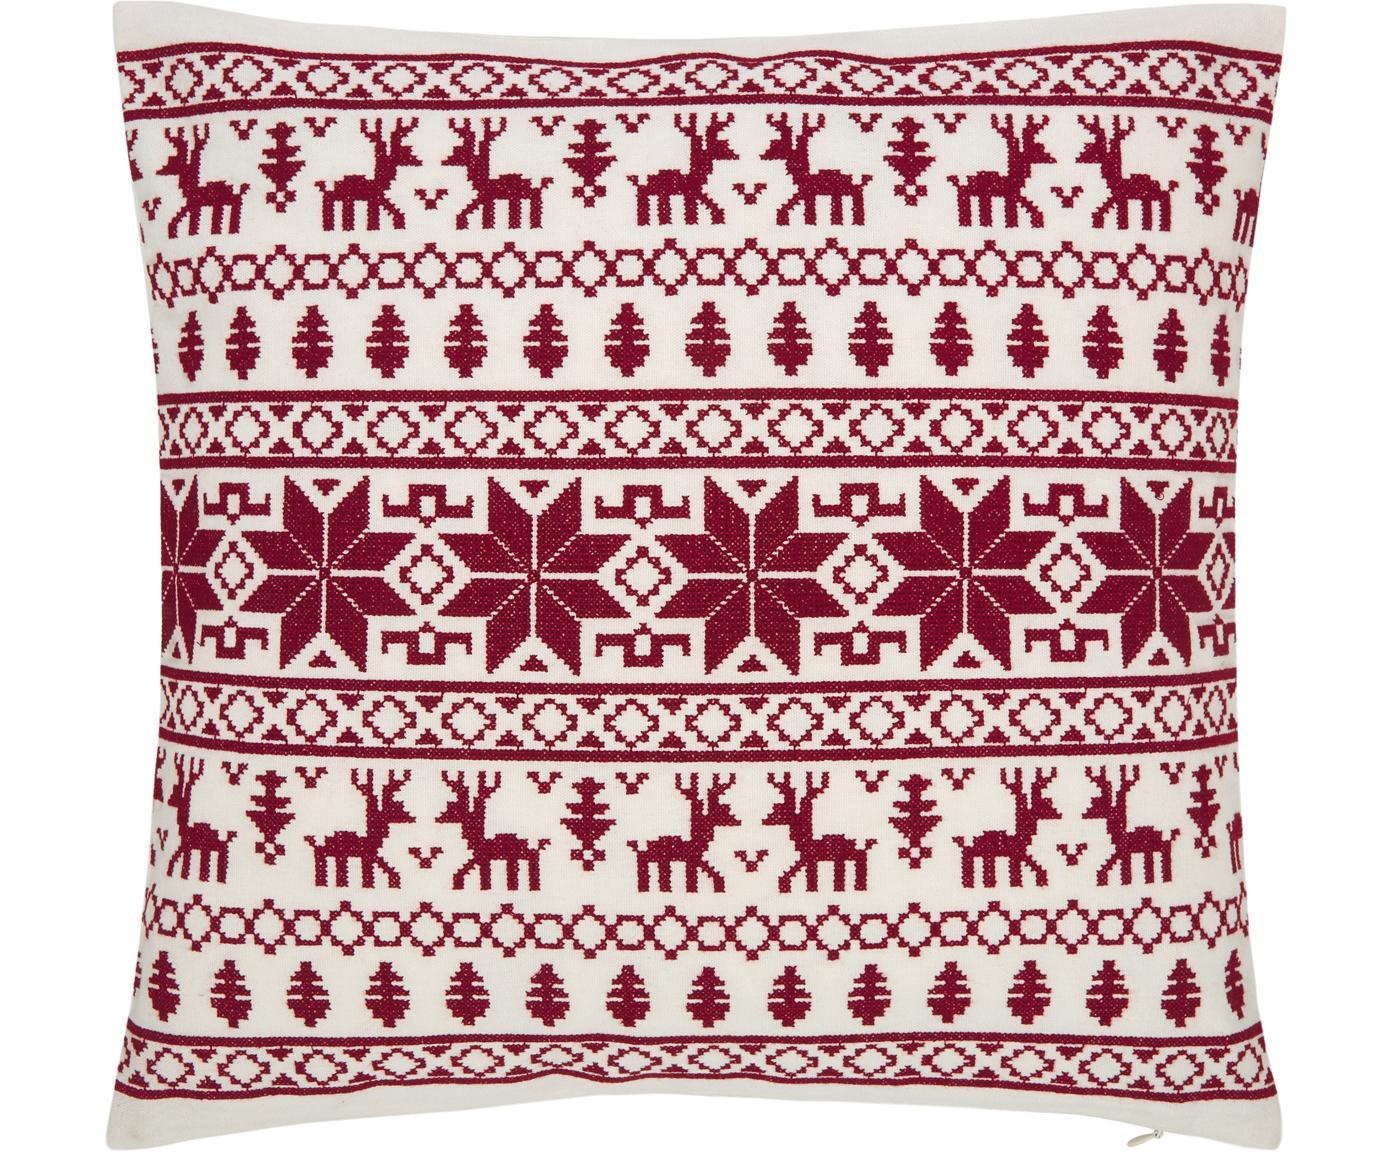 Funda de cojín Orkney, 100%algodón, Rojo, blanco crema, Cama 180/200 cm (260 x 220 cm)